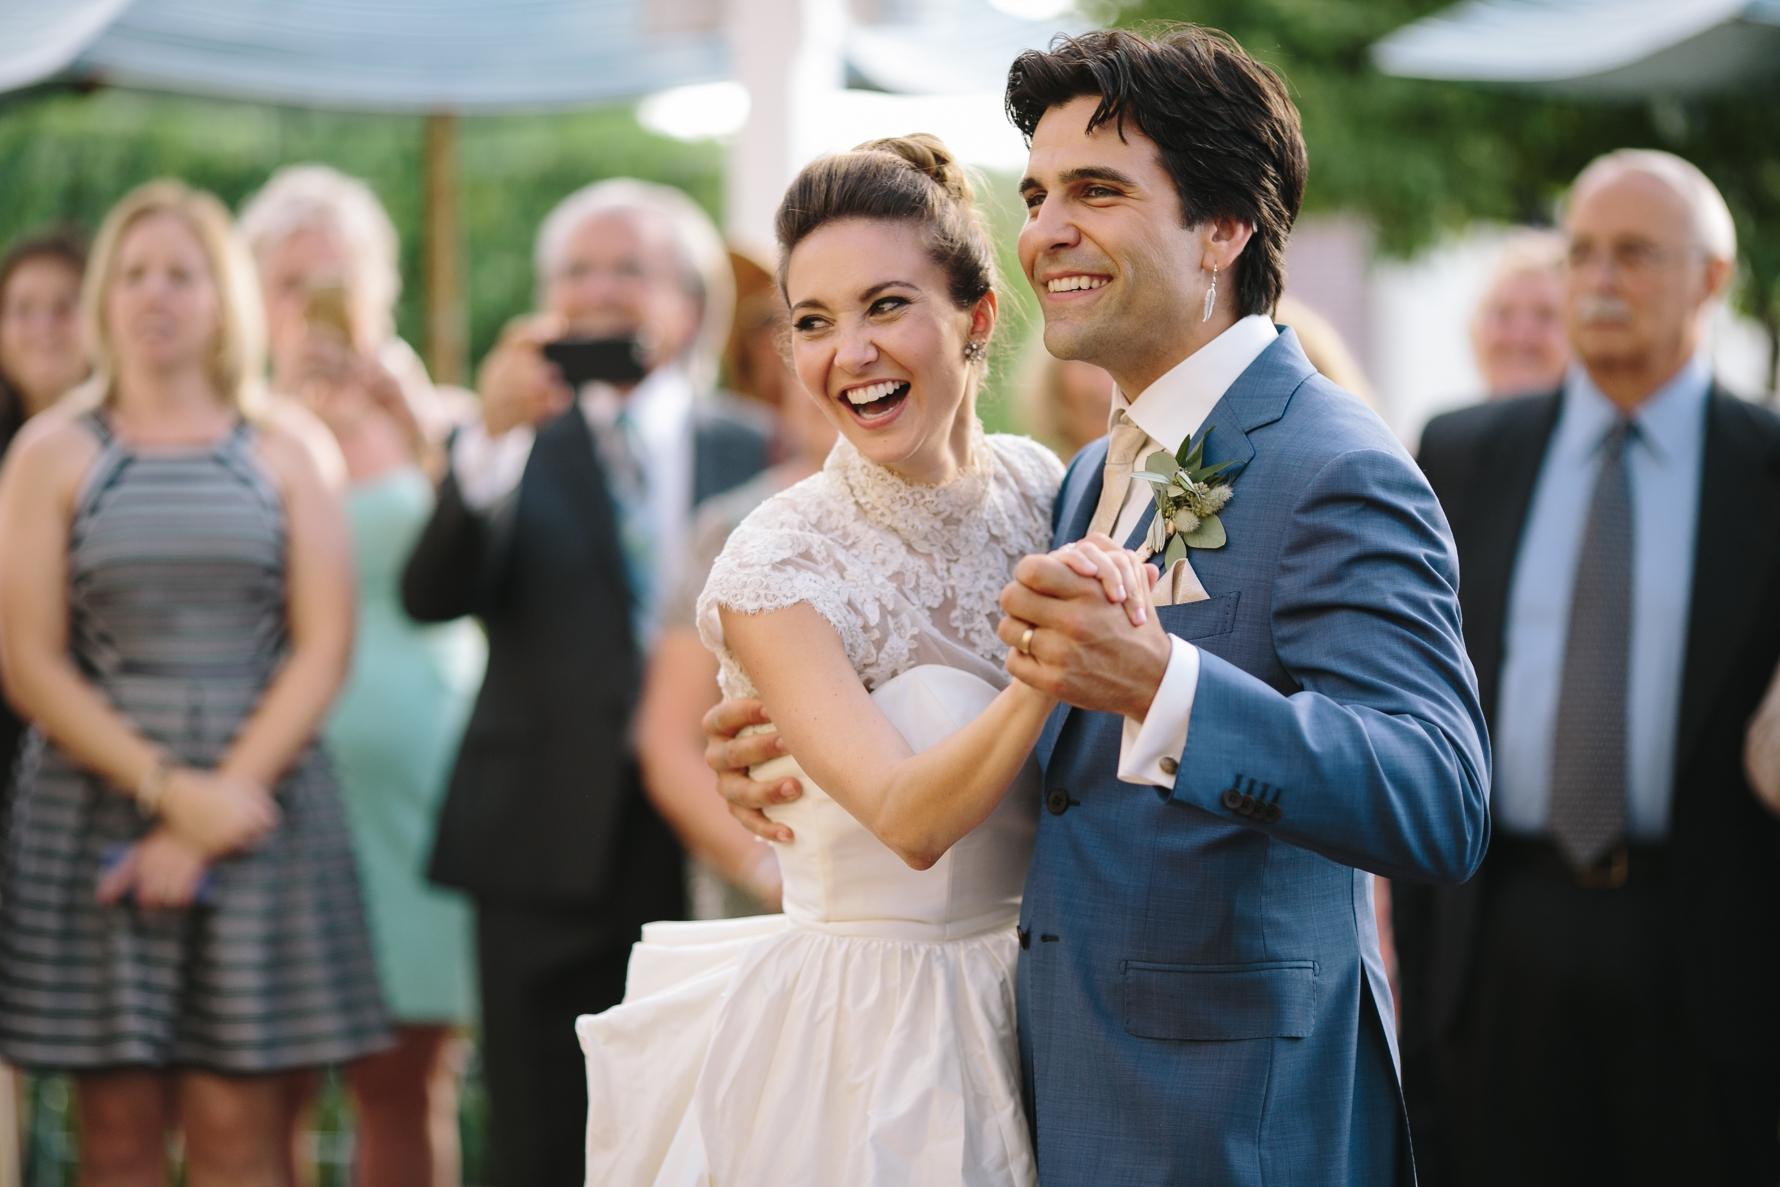 Lindsay + Steel's Petoskey, MI Perry Hotel Wedding